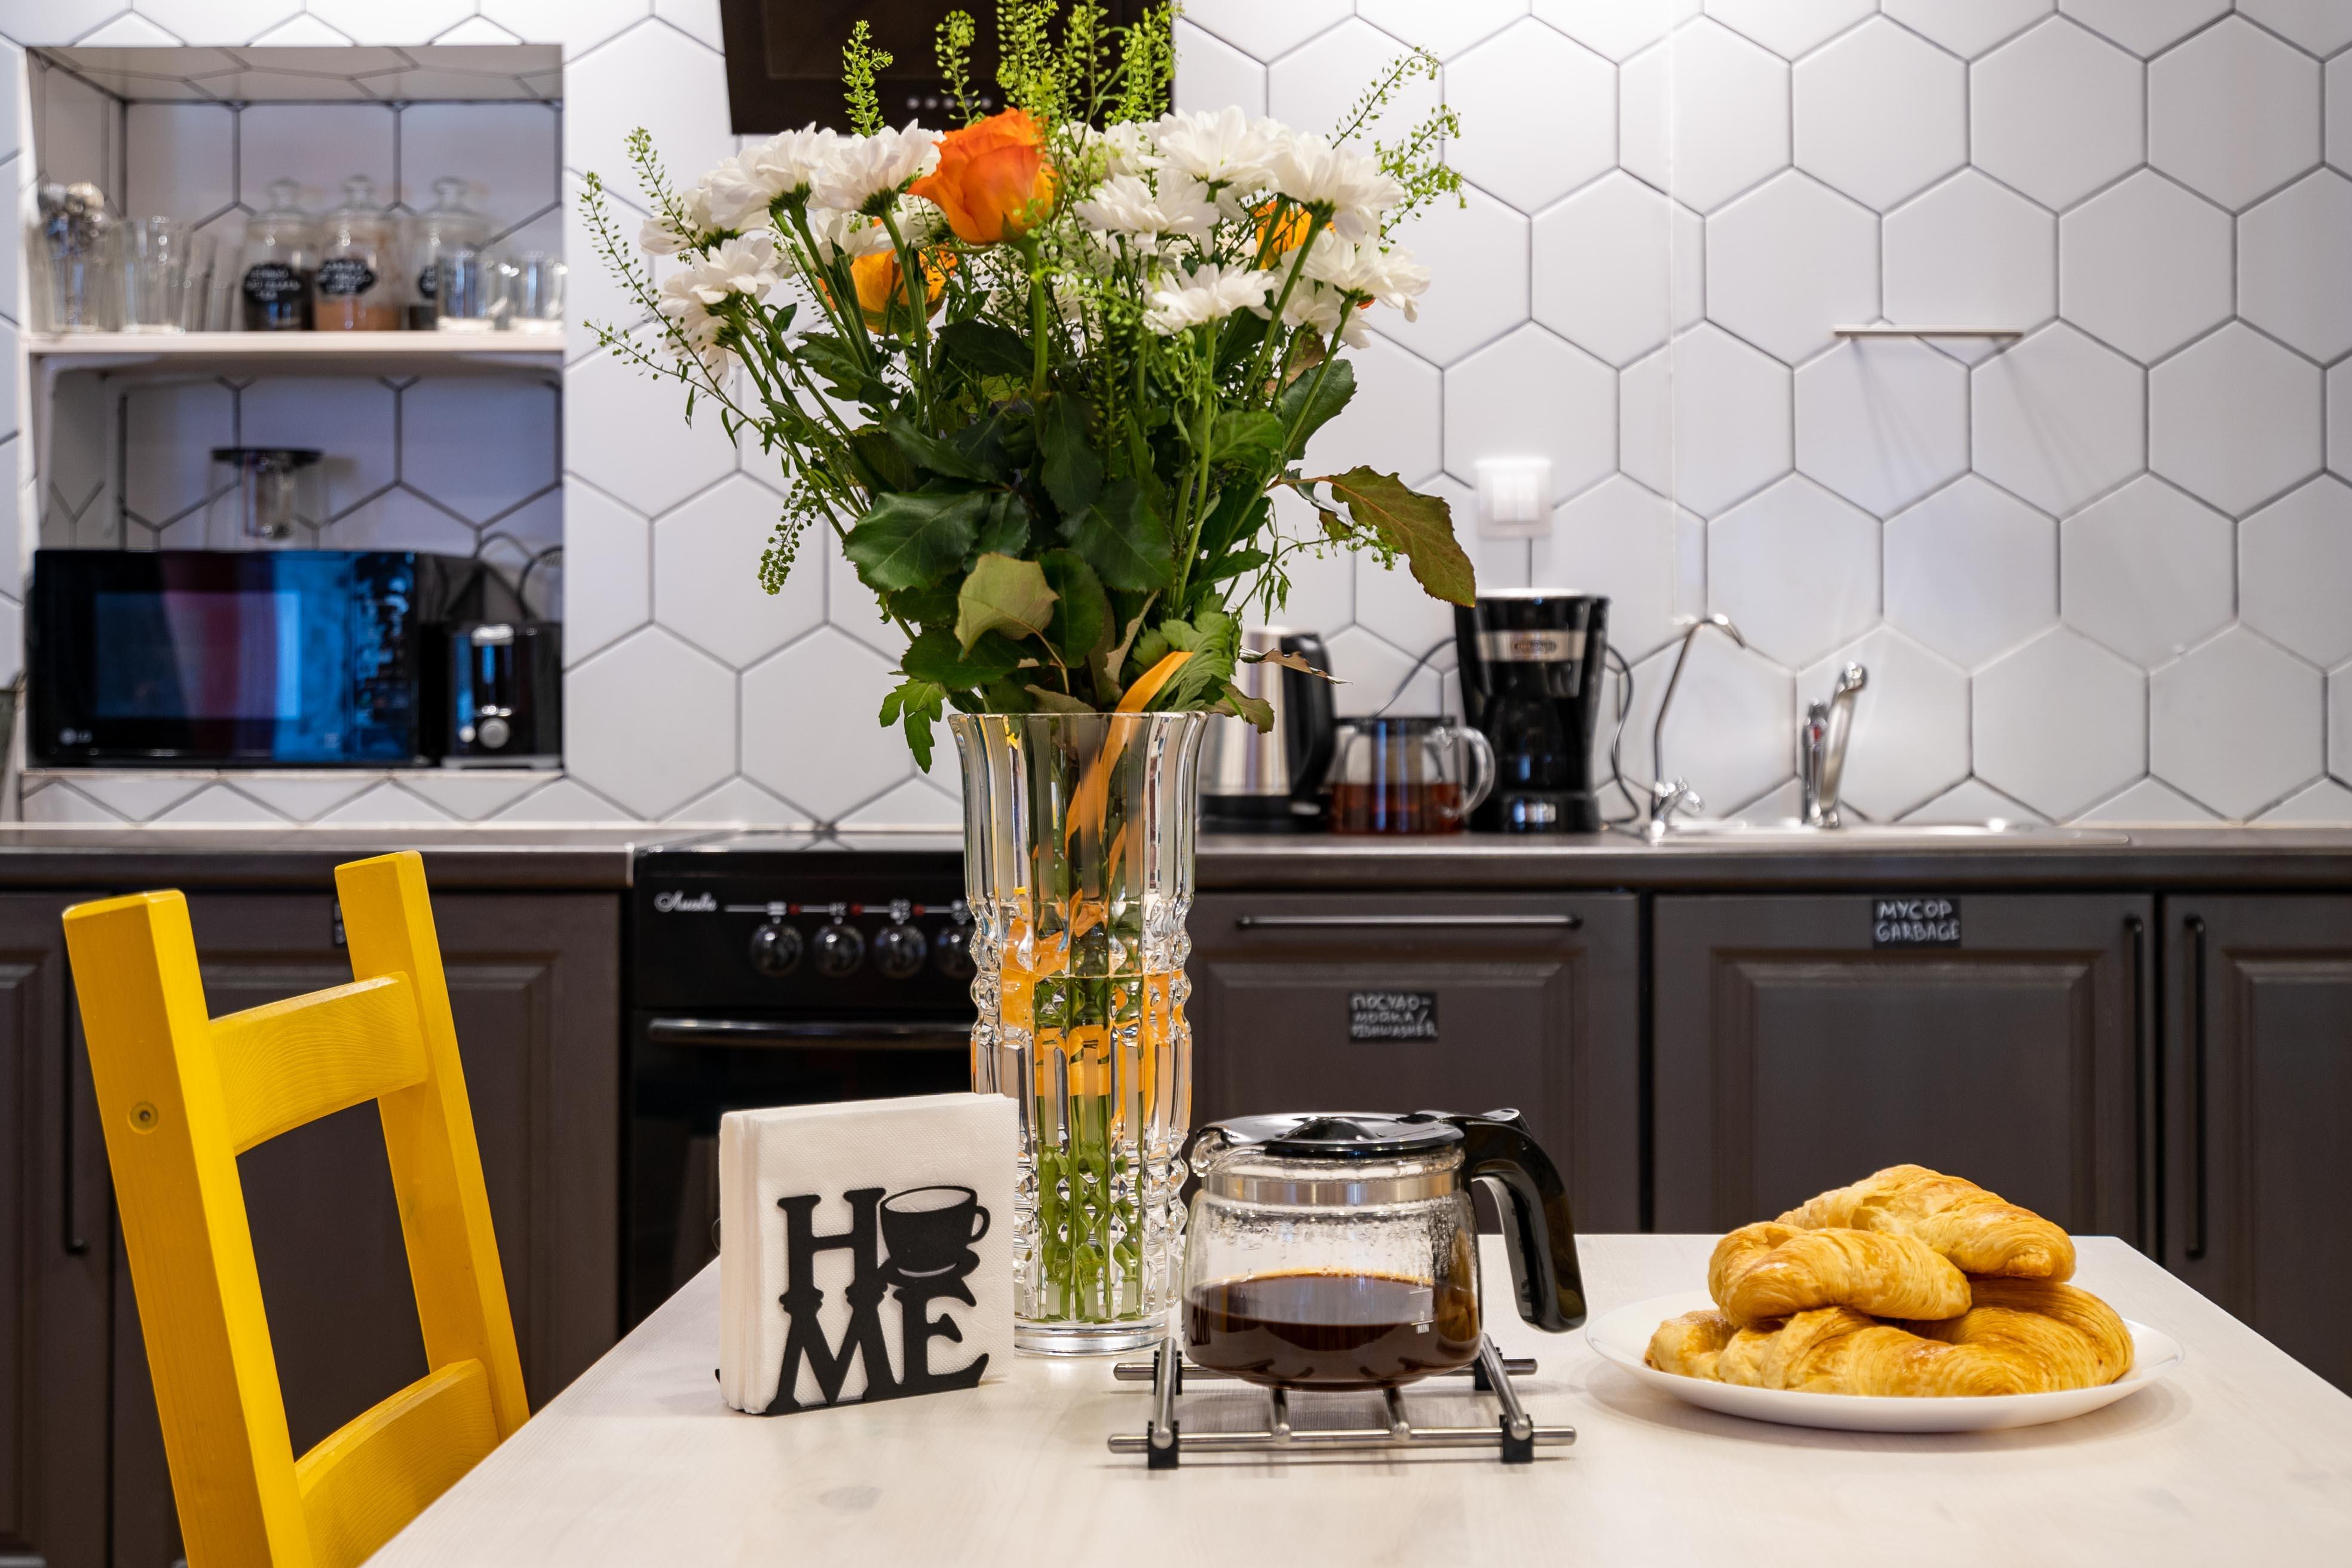 На кухне BookCase Hostel есть микроволновка, тостер, холодильник, морозилка, плита, духовка, электри